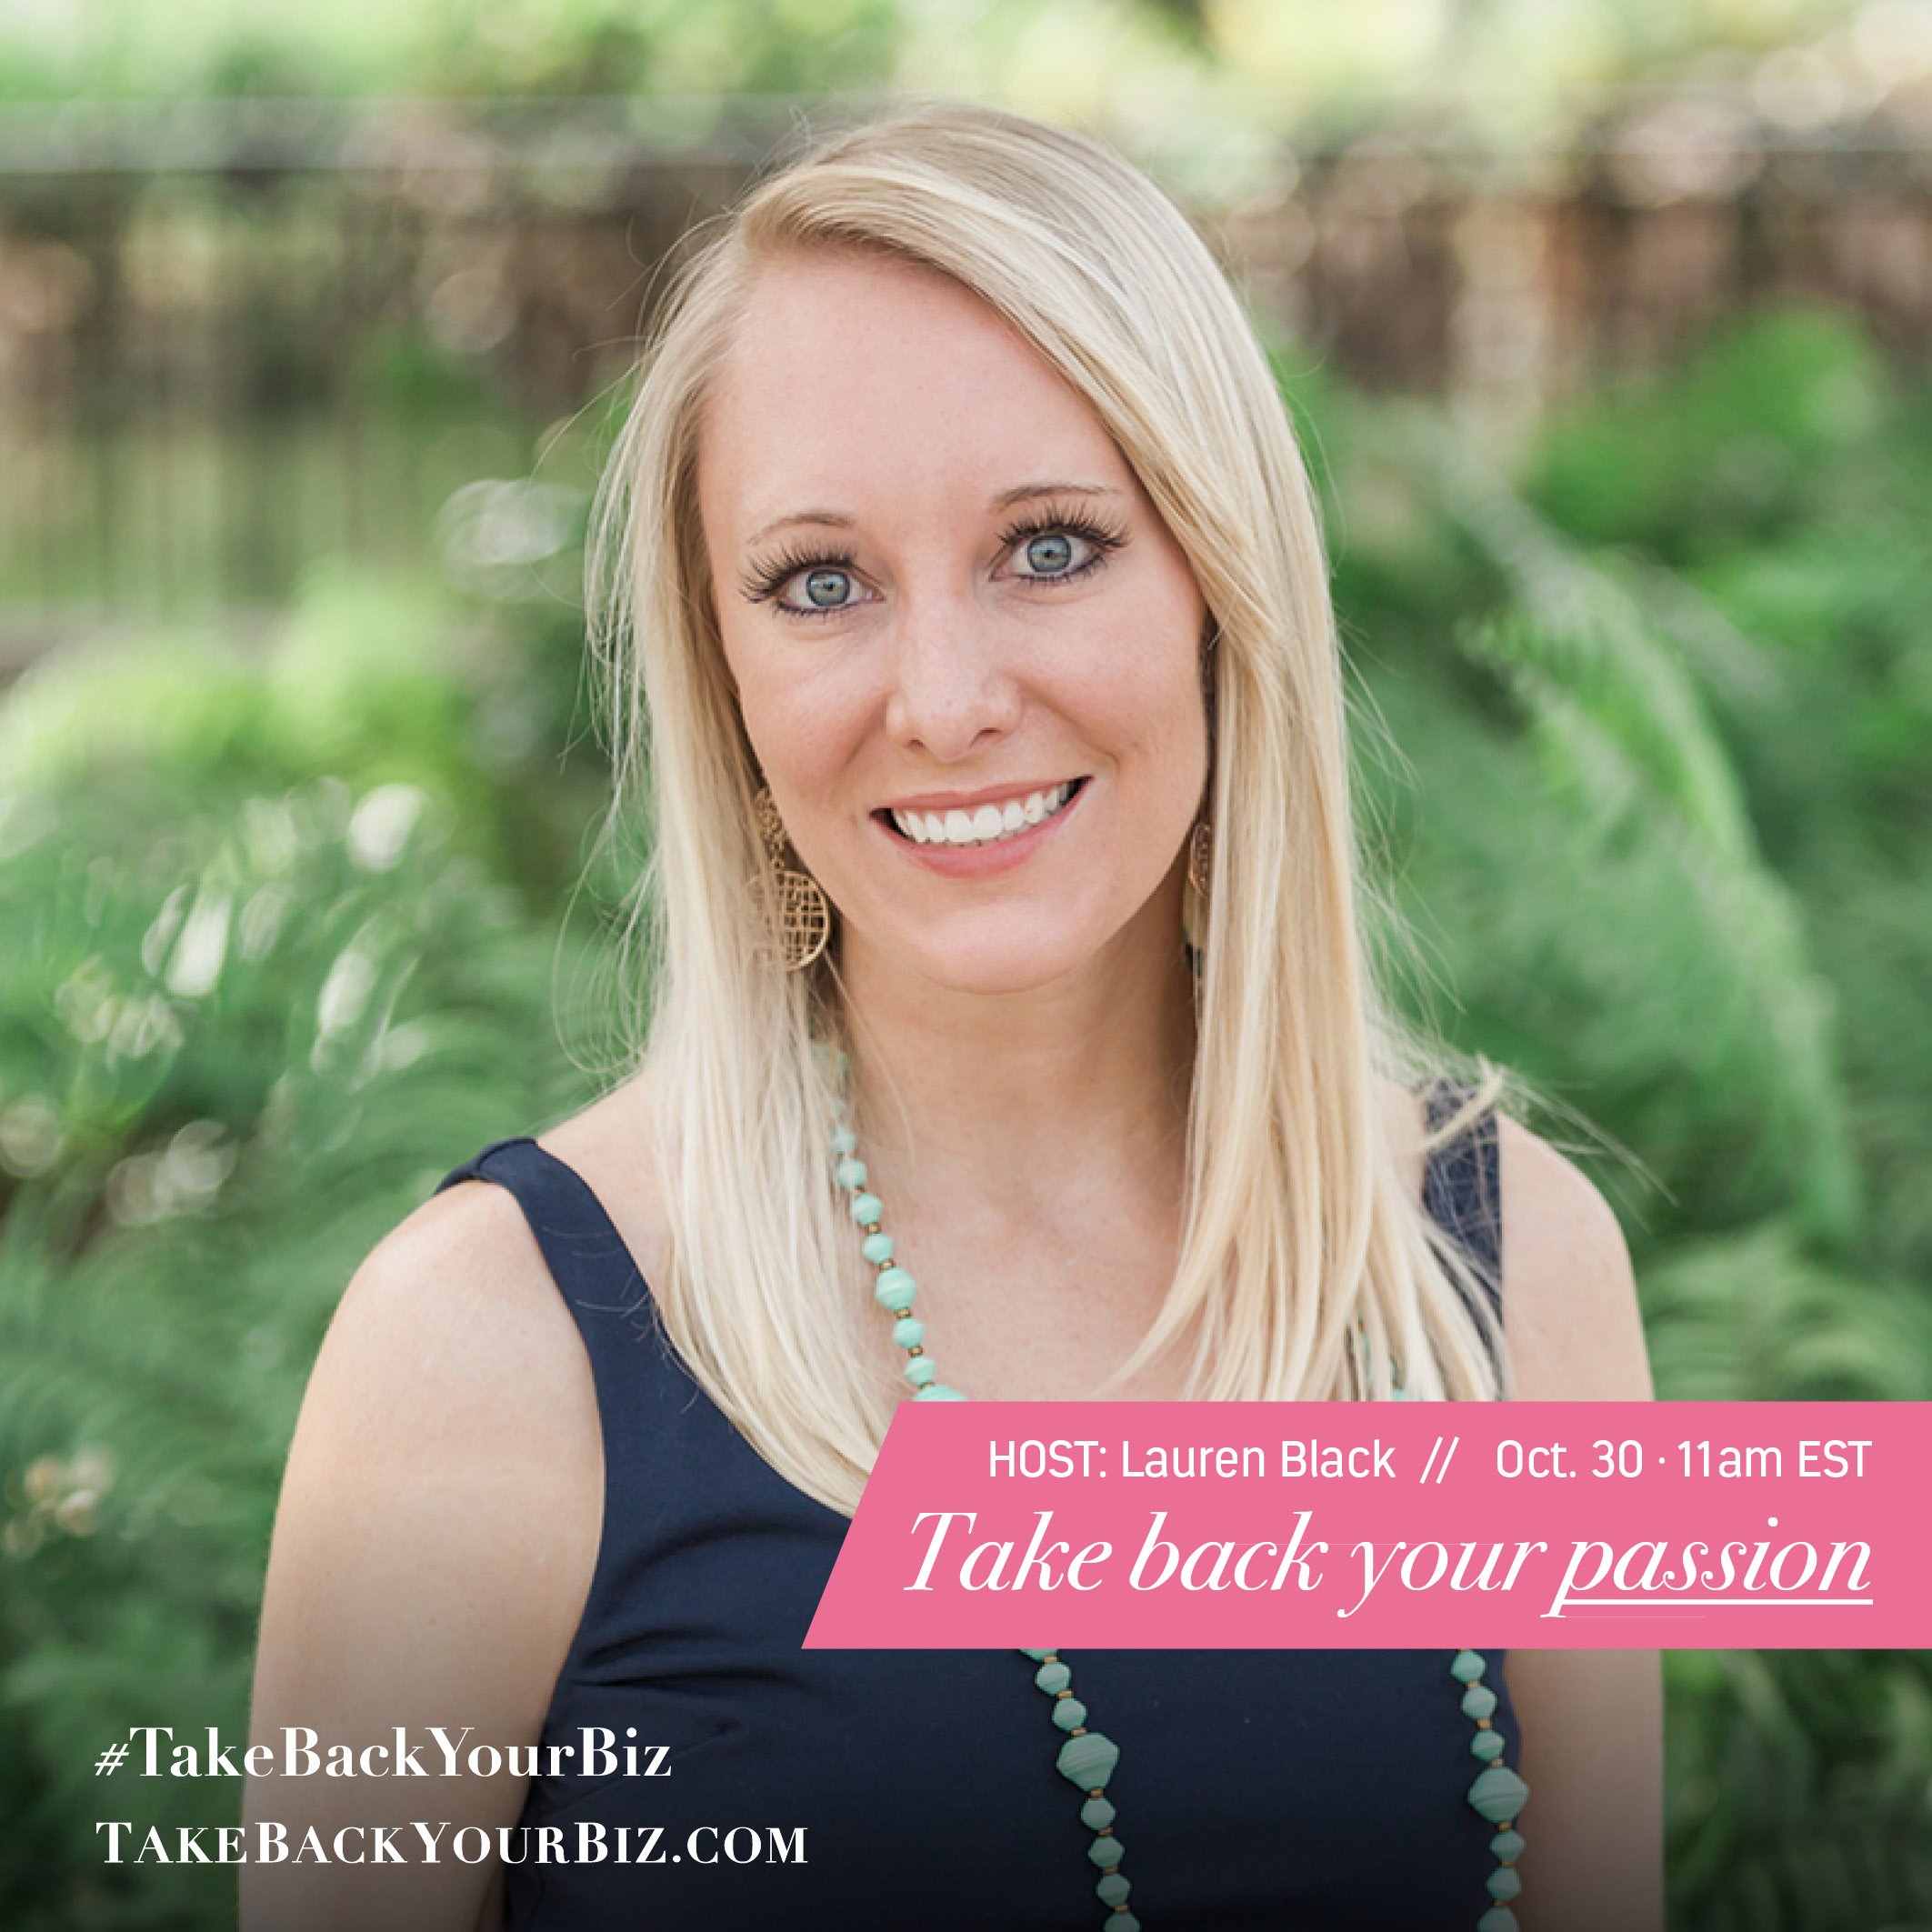 Take-Back-Your-Biz-Speakers-Lauren-Black-Bosscation